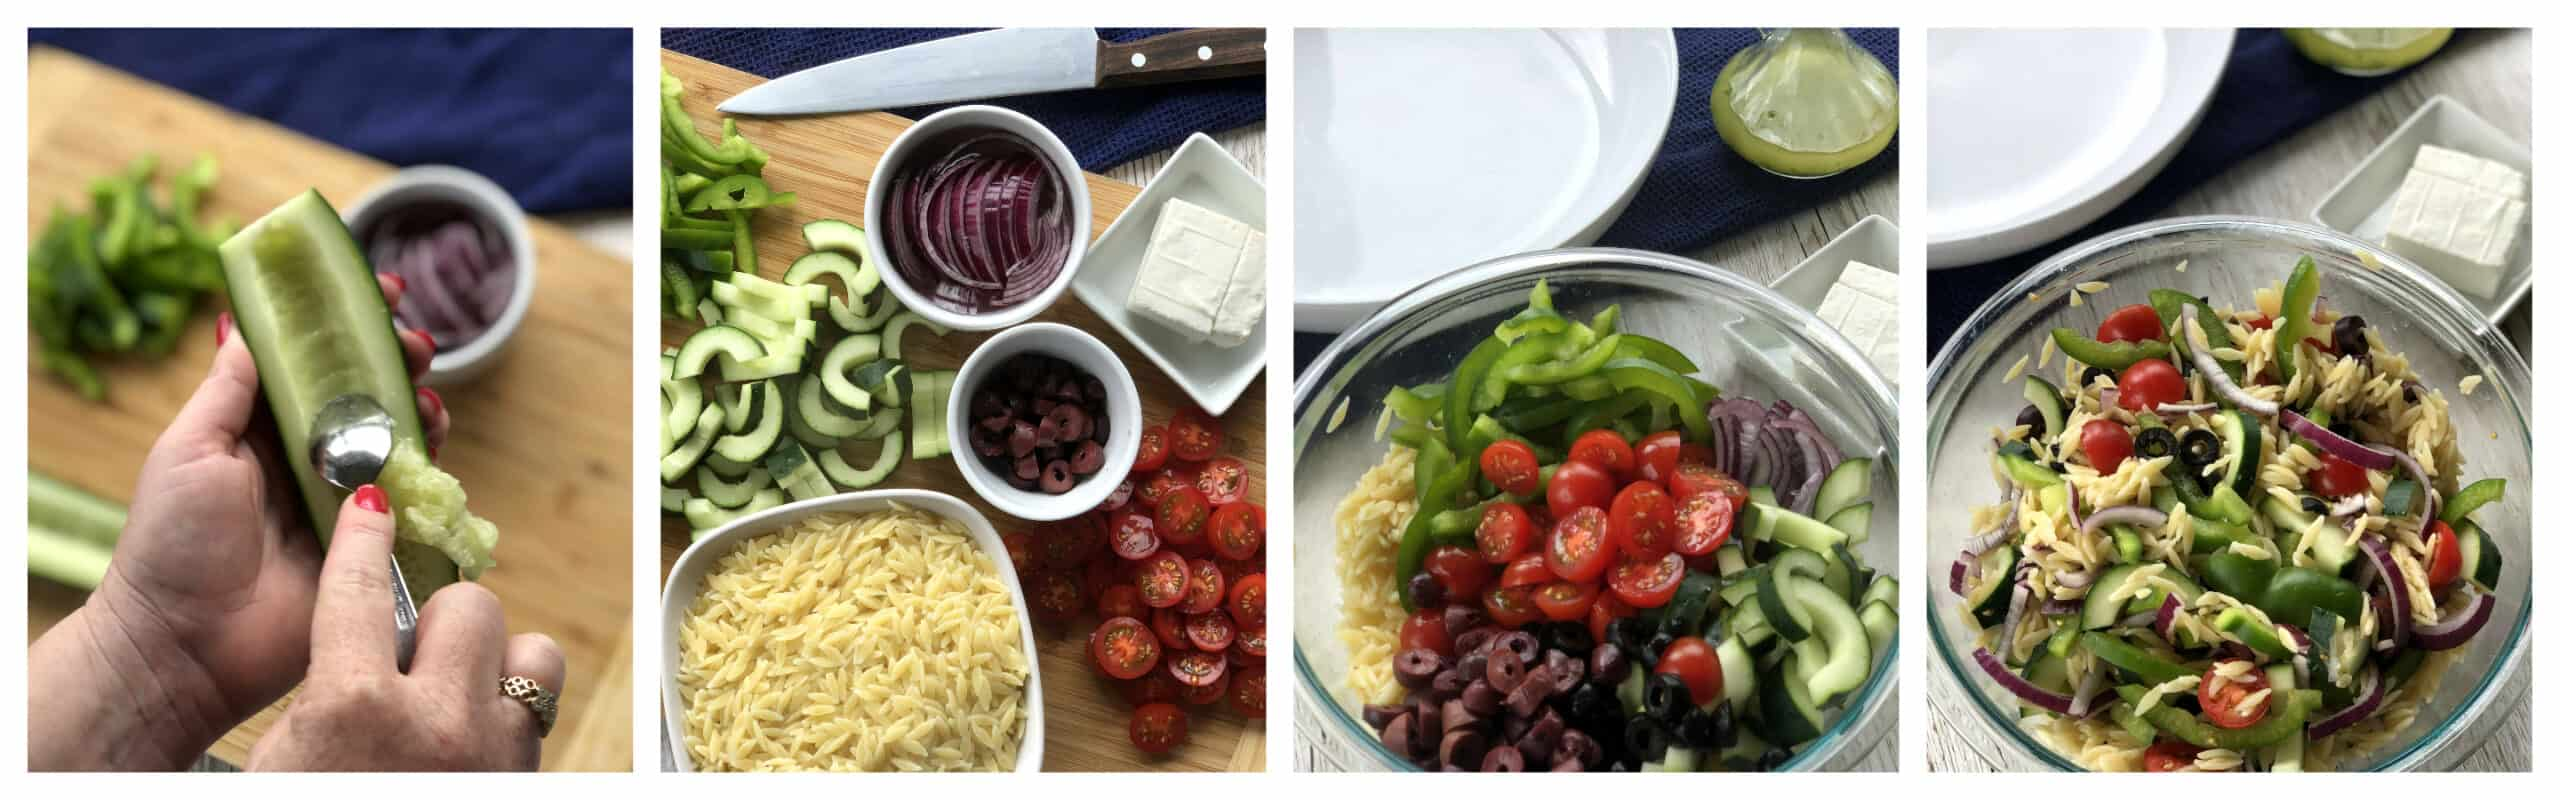 How to make a greek orzo salad